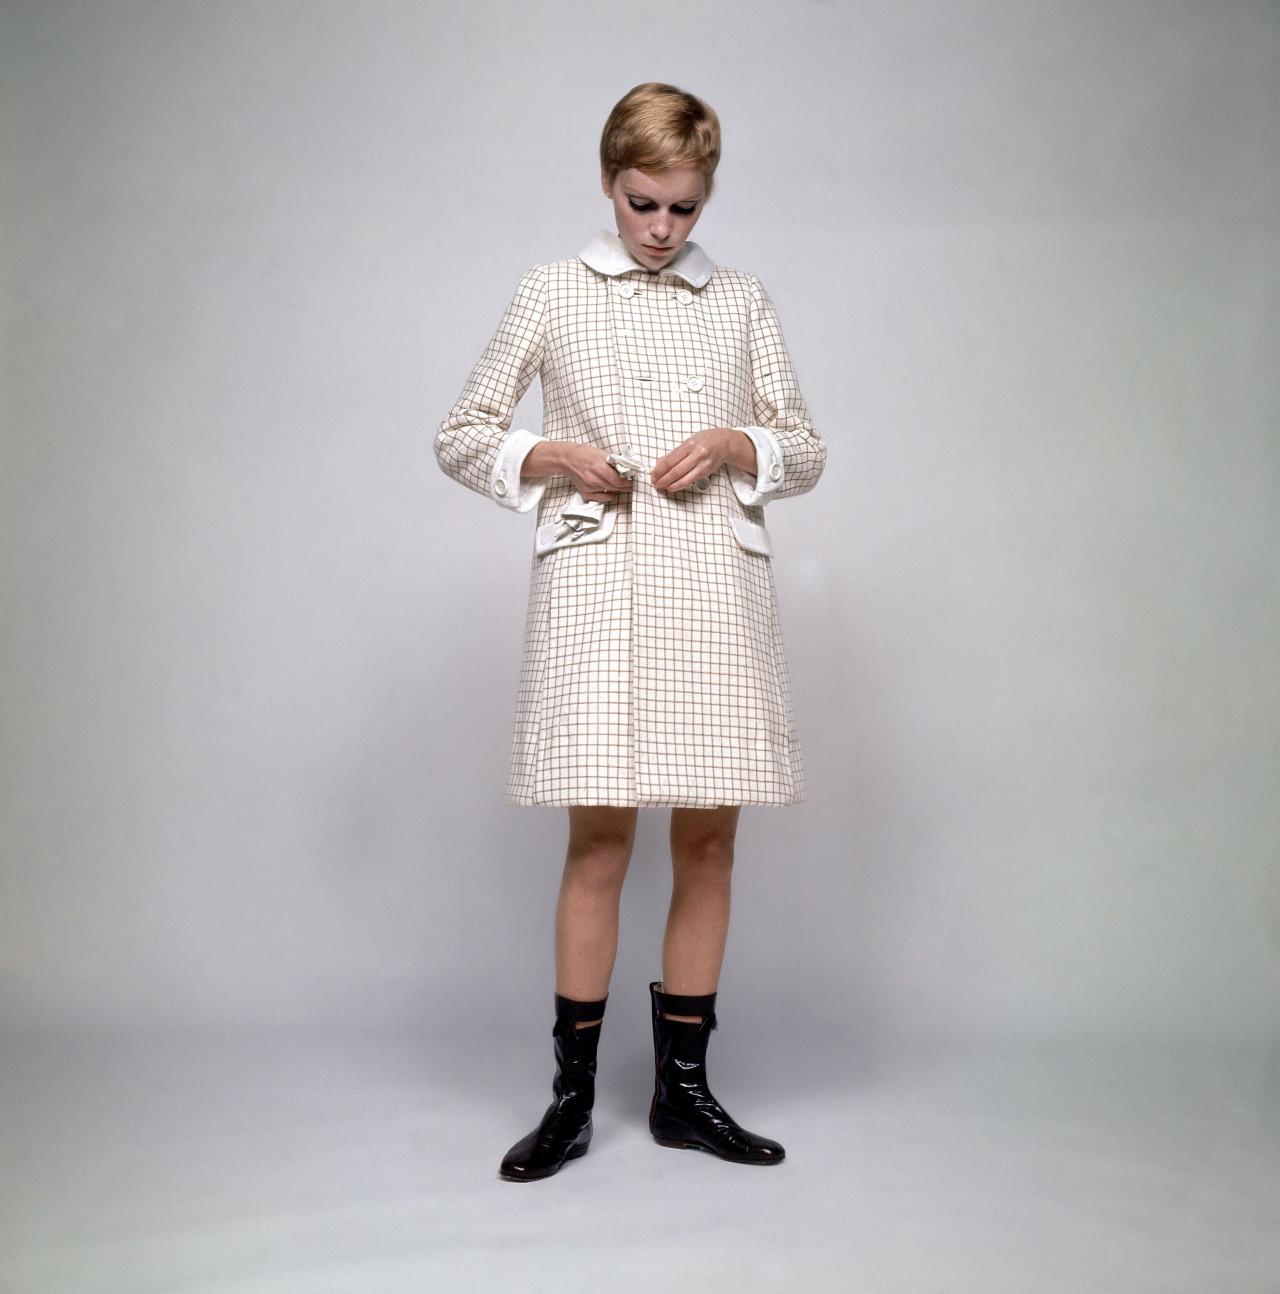 1967 Mia Farrow in Courreges